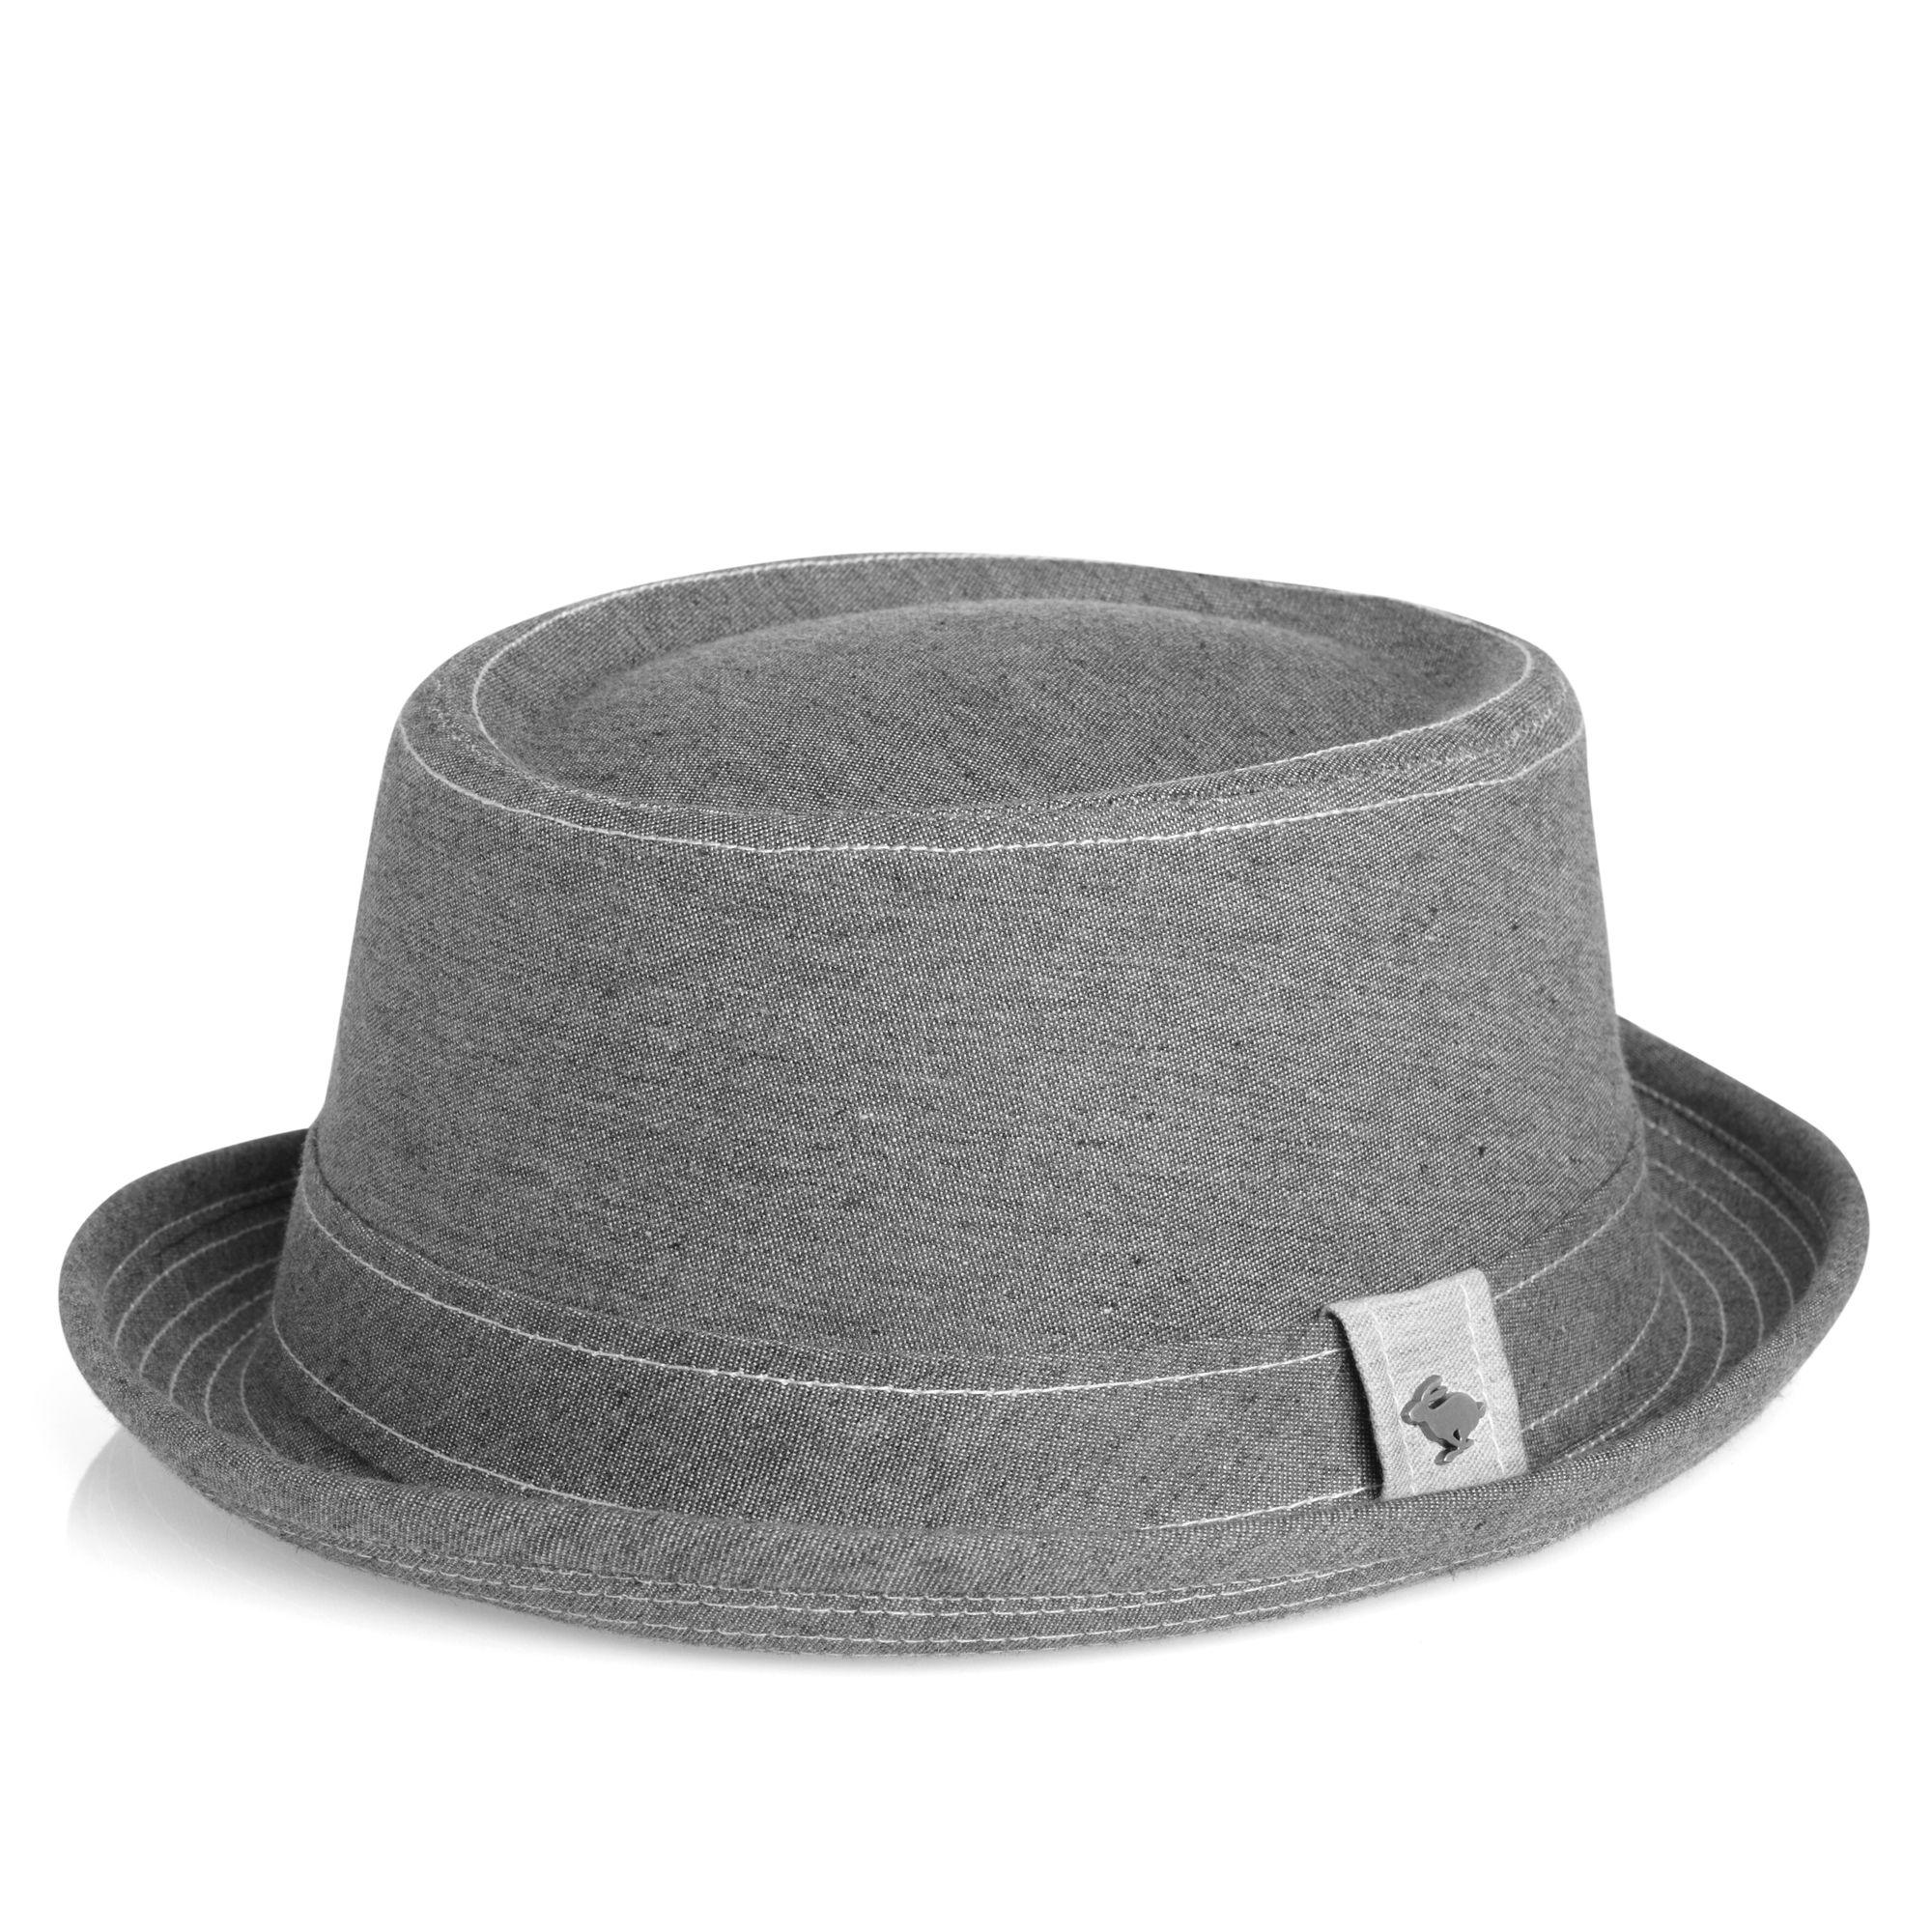 Porkpie hats for the groomsmen